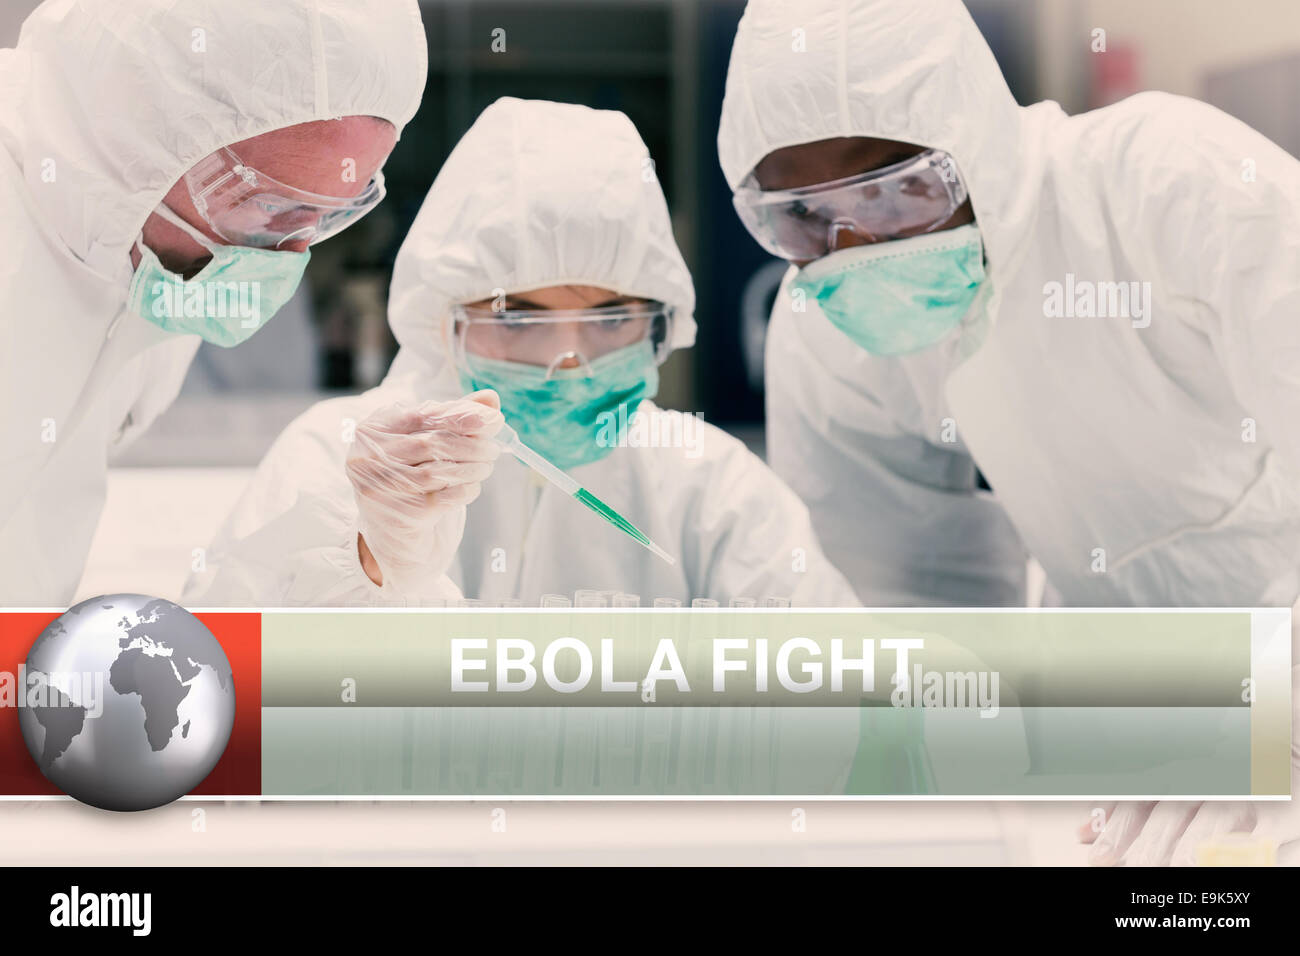 Ebola news flash with medical imagery - Stock Image